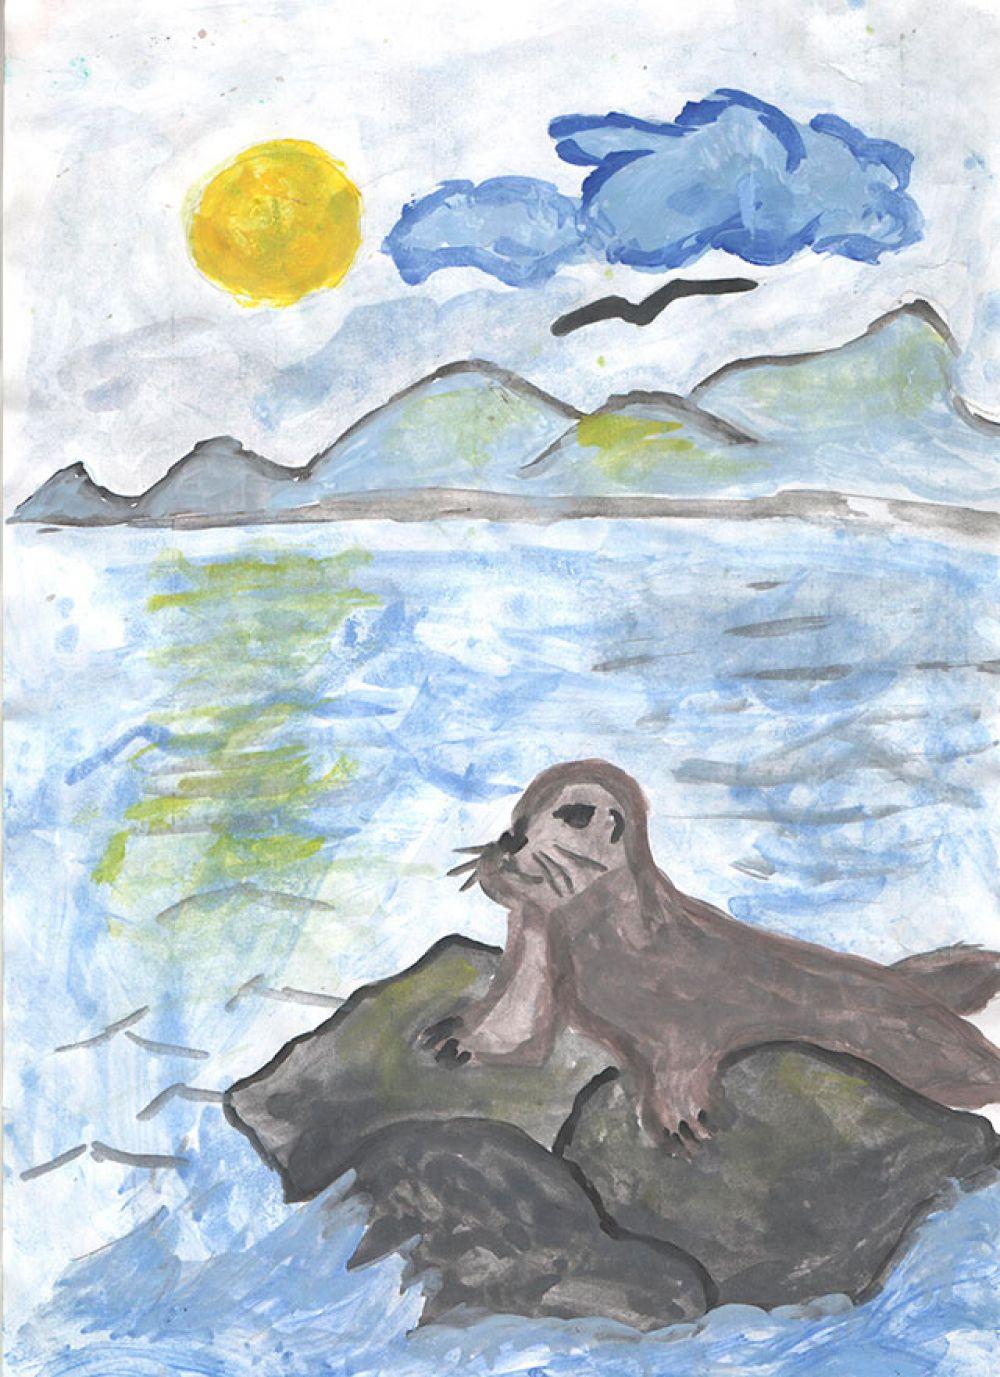 Участник №99 Тимур Талаев, 5 лет.